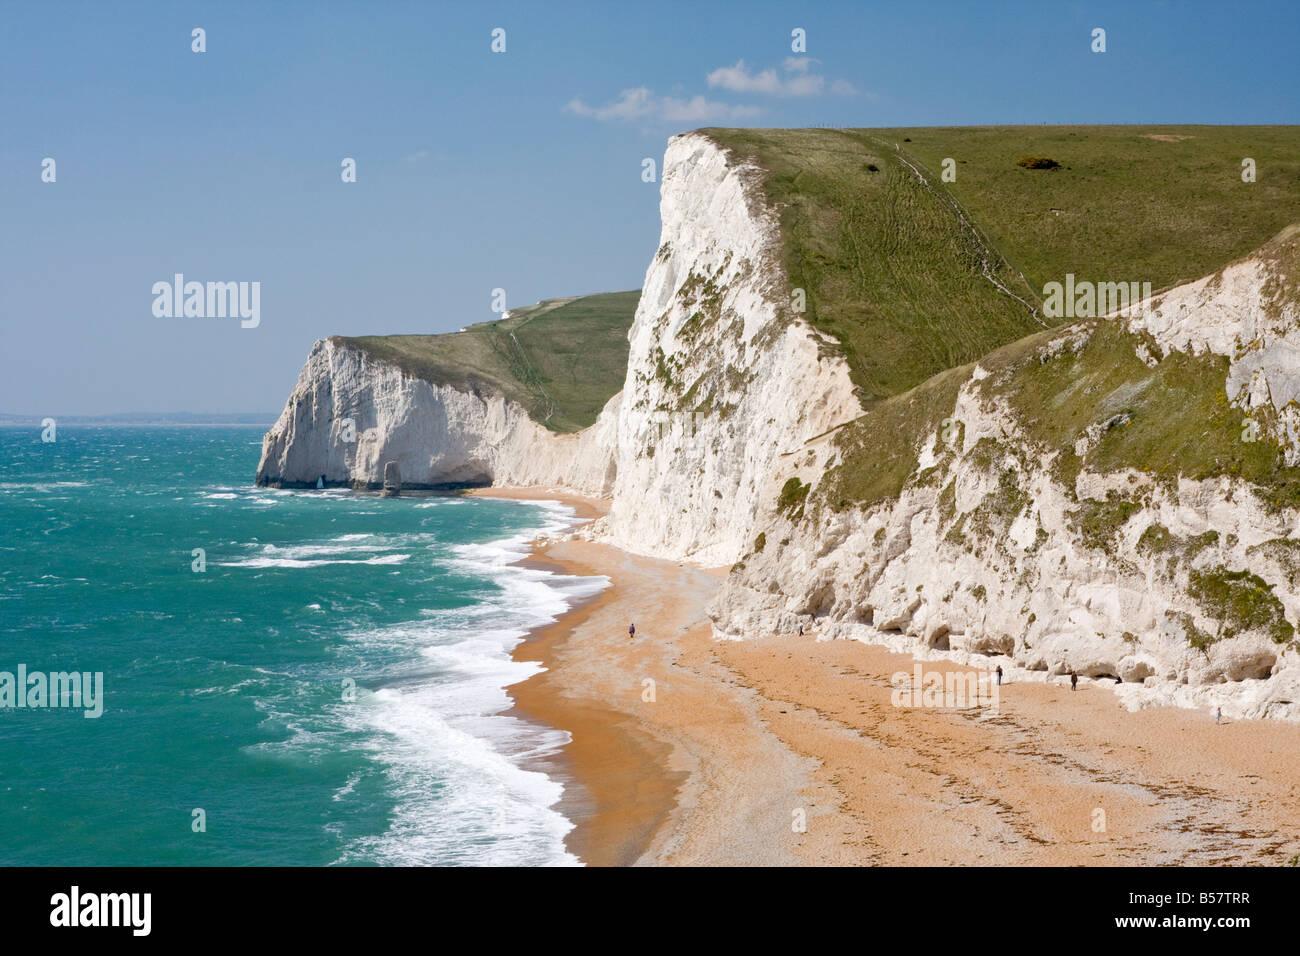 Cabeza Swyre y Bat en la cabeza, Dorset, Inglaterra, Reino Unido, Europa Foto de stock